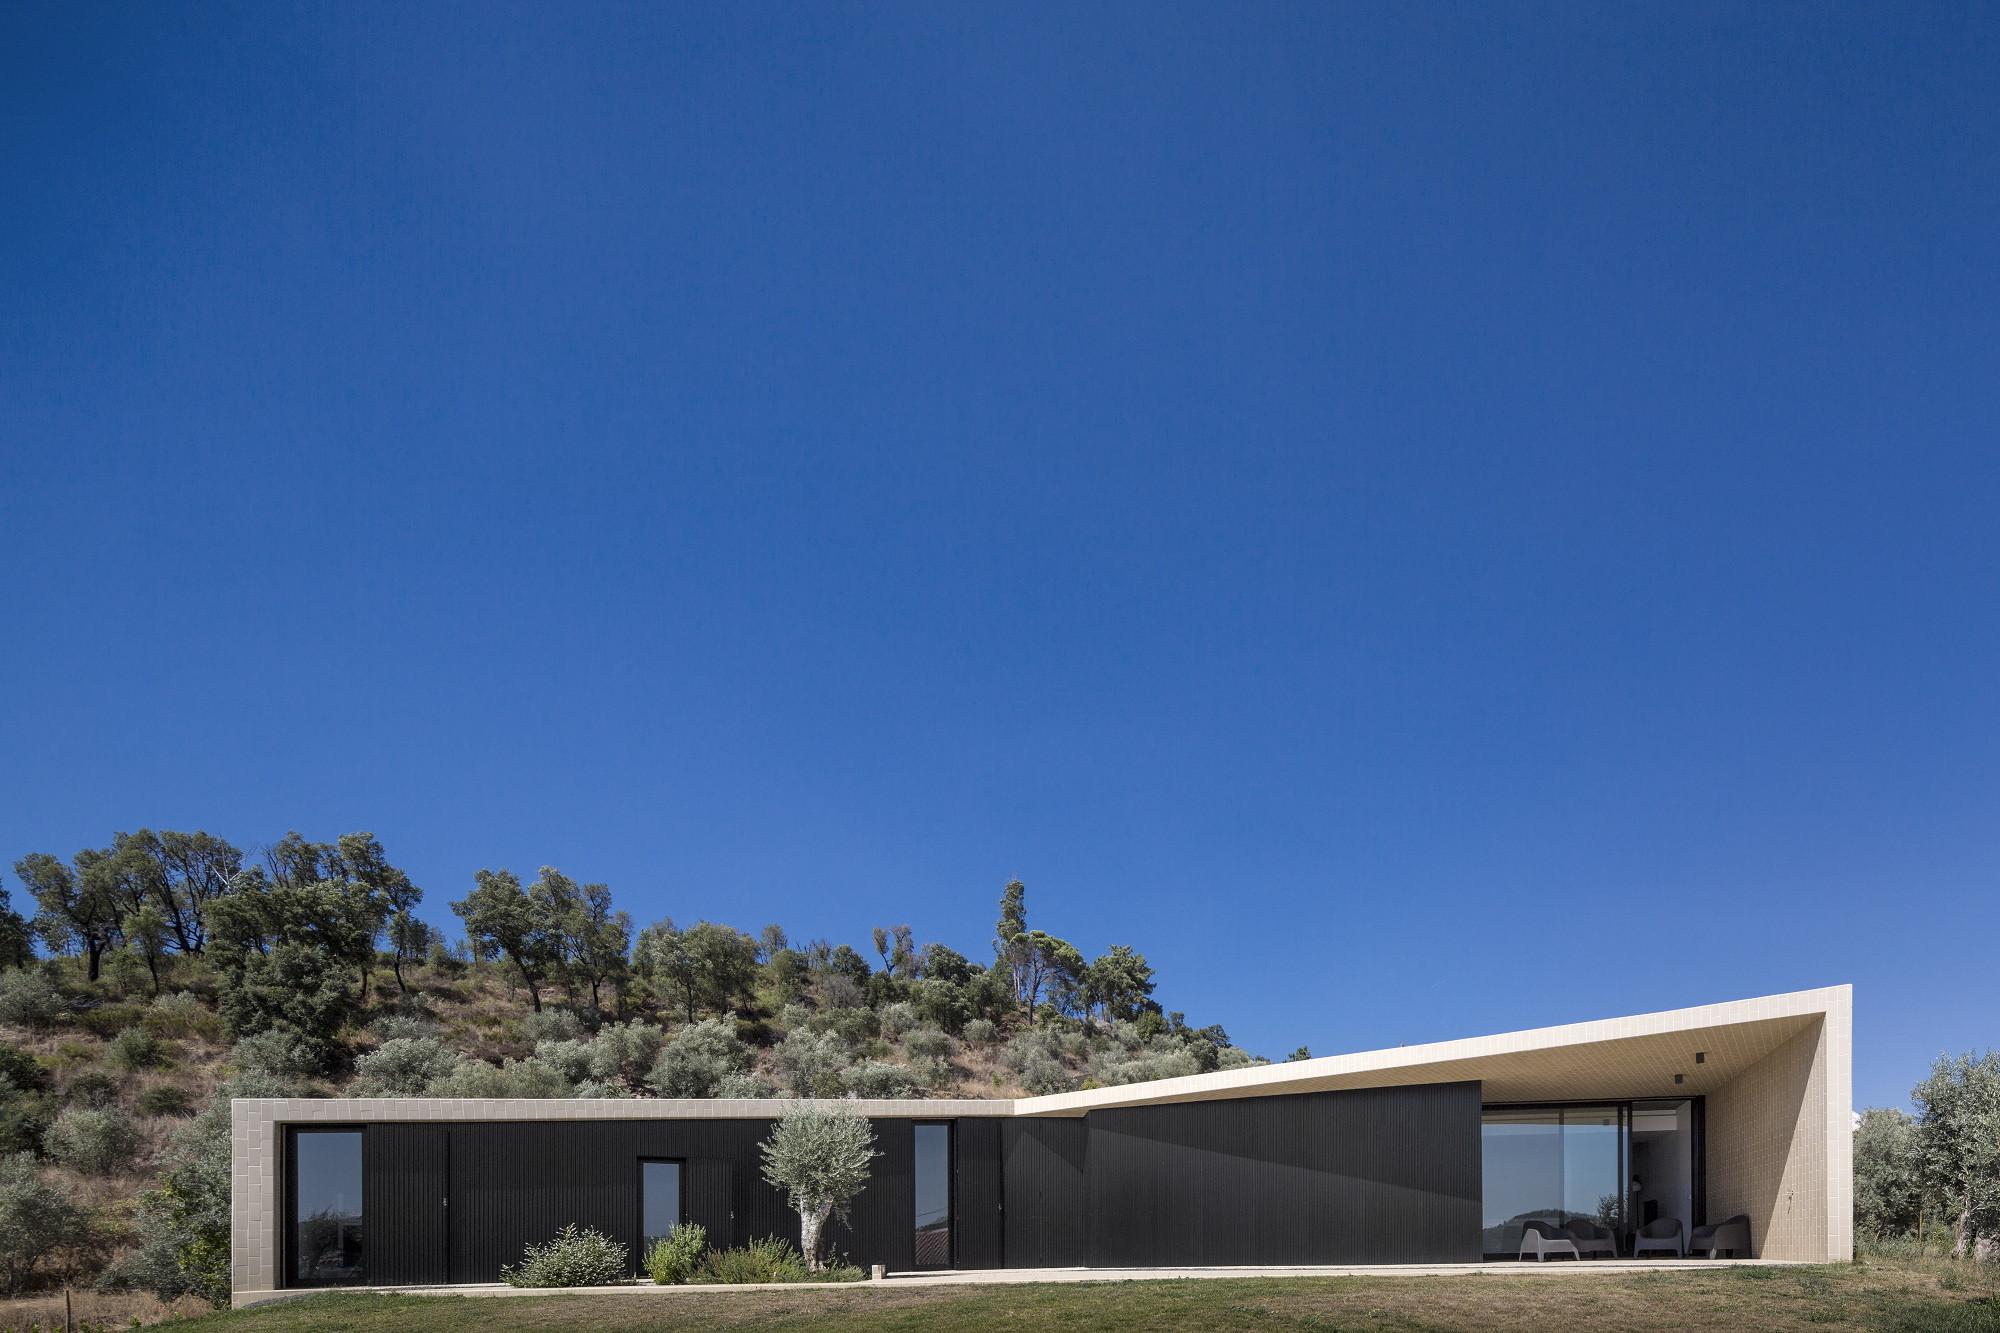 Casa Serra de Tomar / Contaminar Arquitectos, © Fernando Guerra | FG+SG